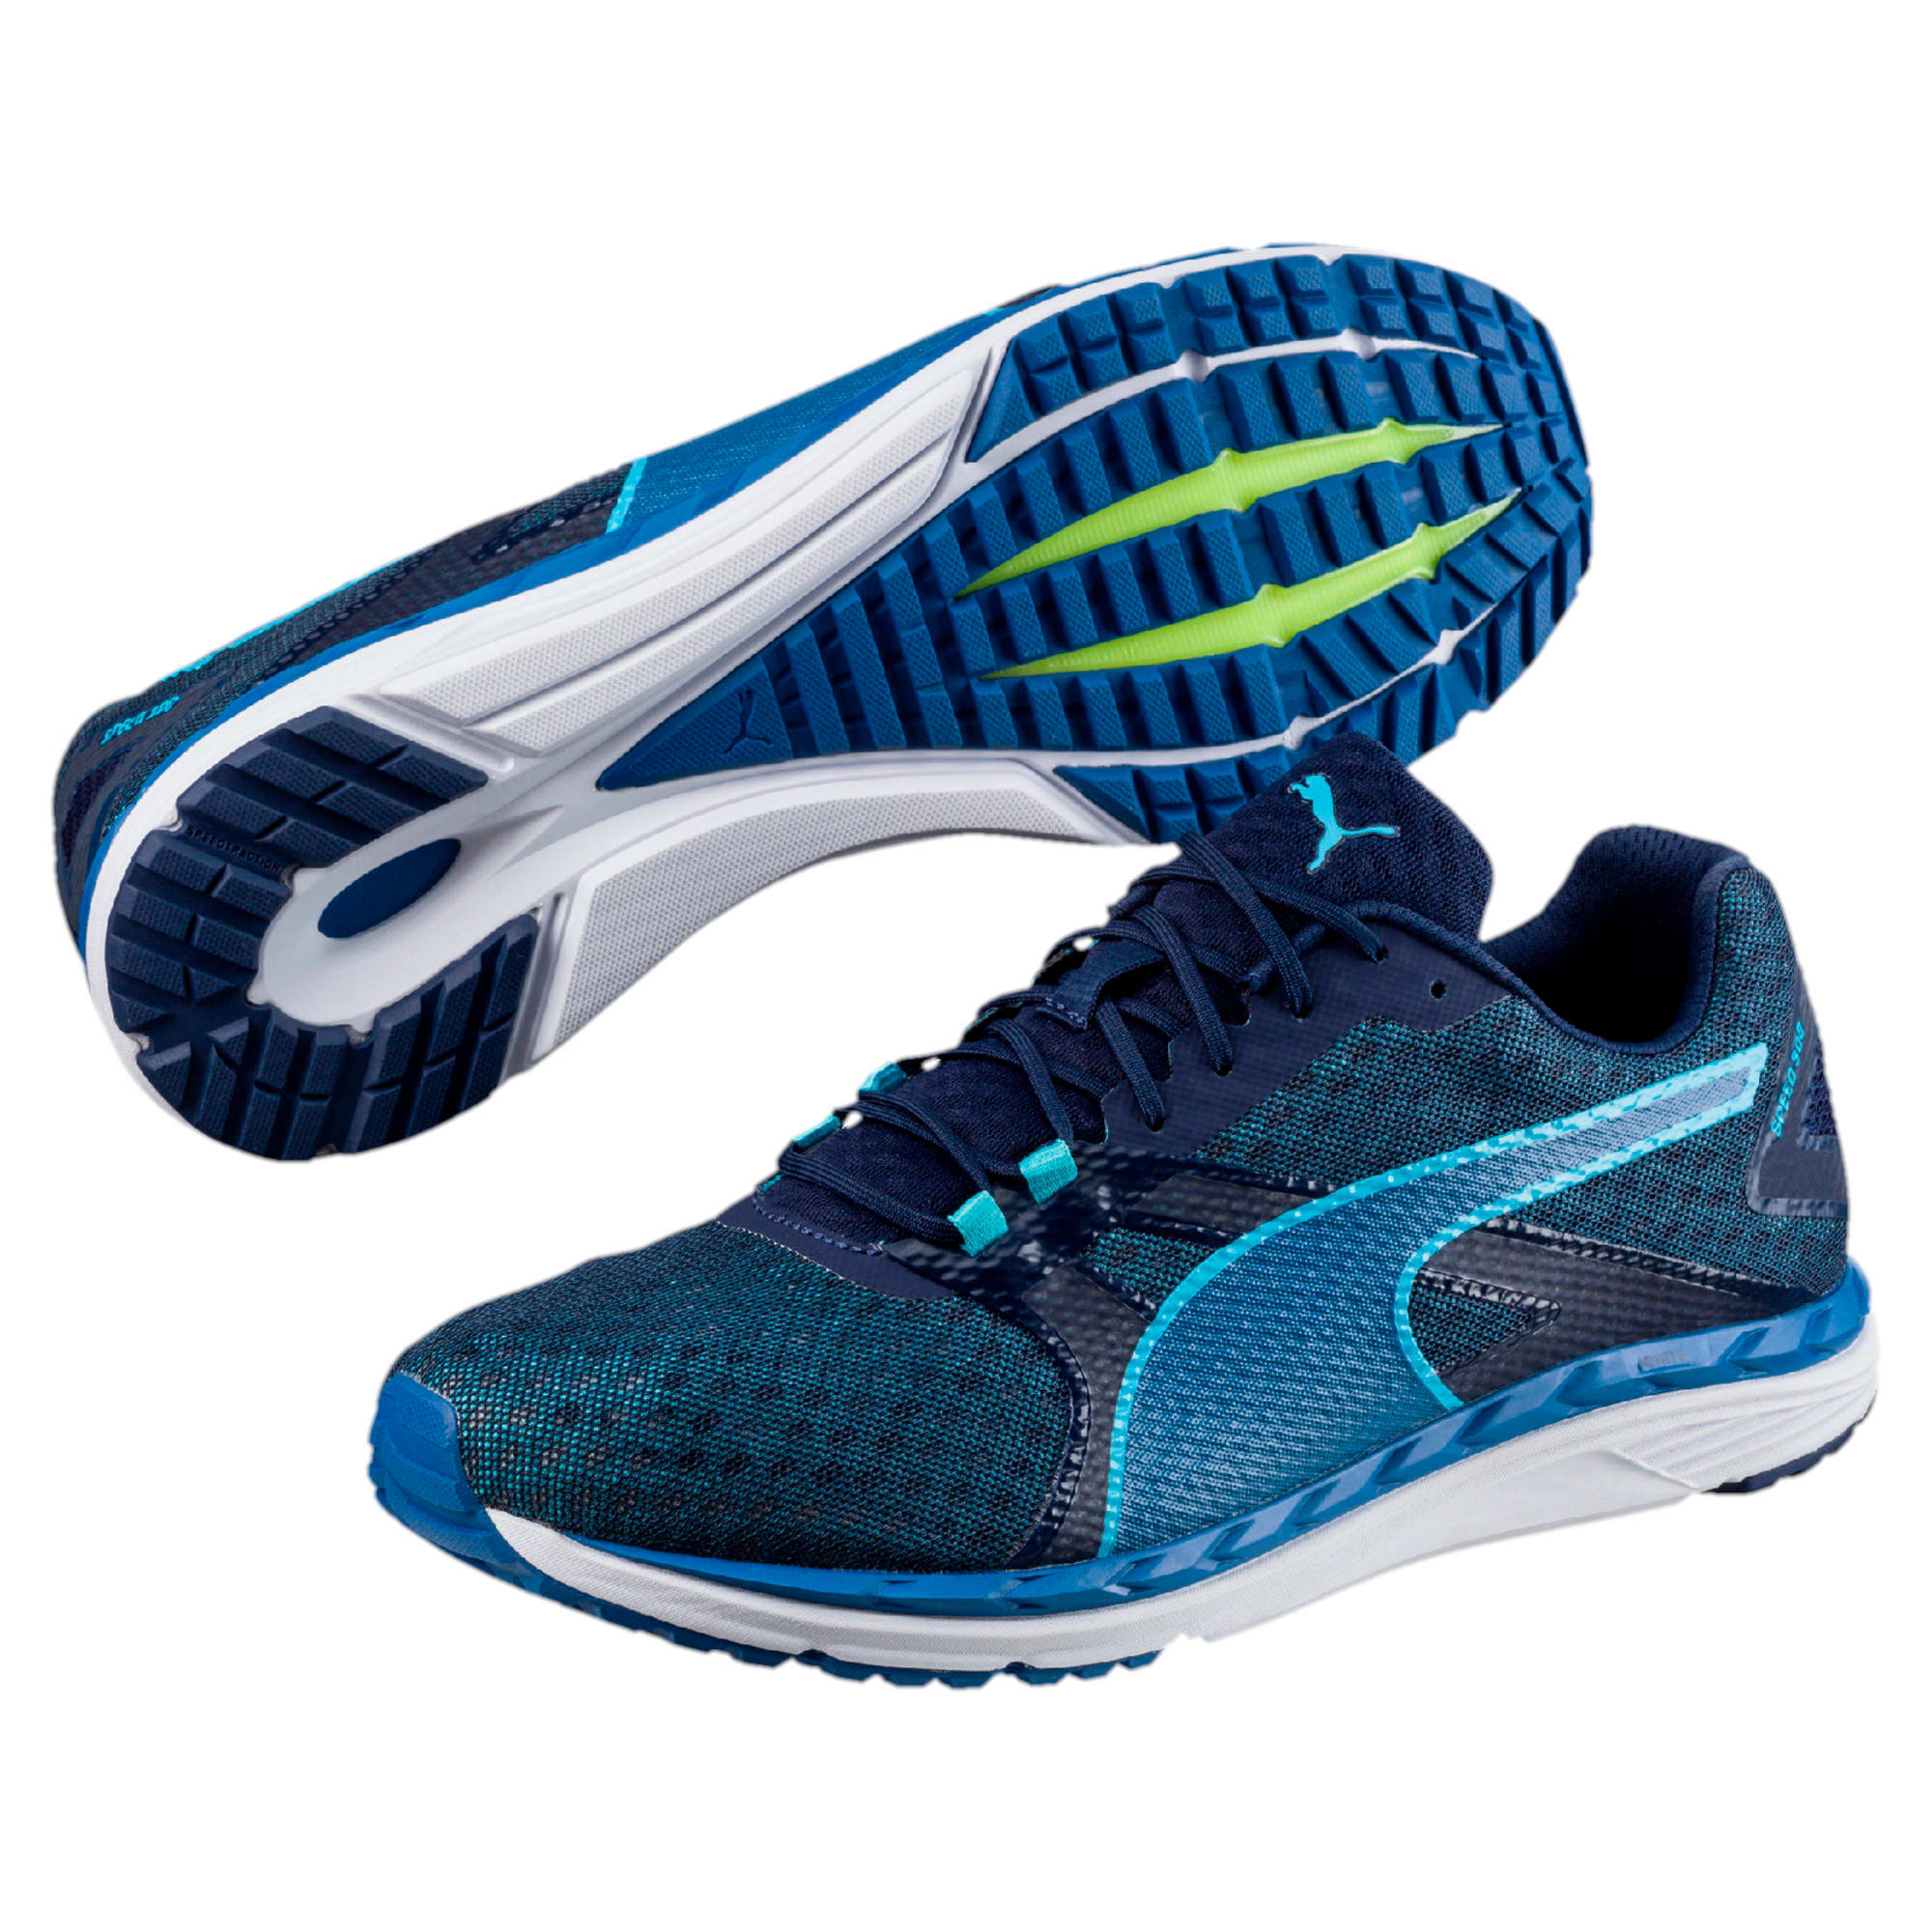 Thumbnail 6 of Speed 300 IGNITE 2 Men's Running Shoes, LapisBlue-BlueDepths-Turq, medium-IND